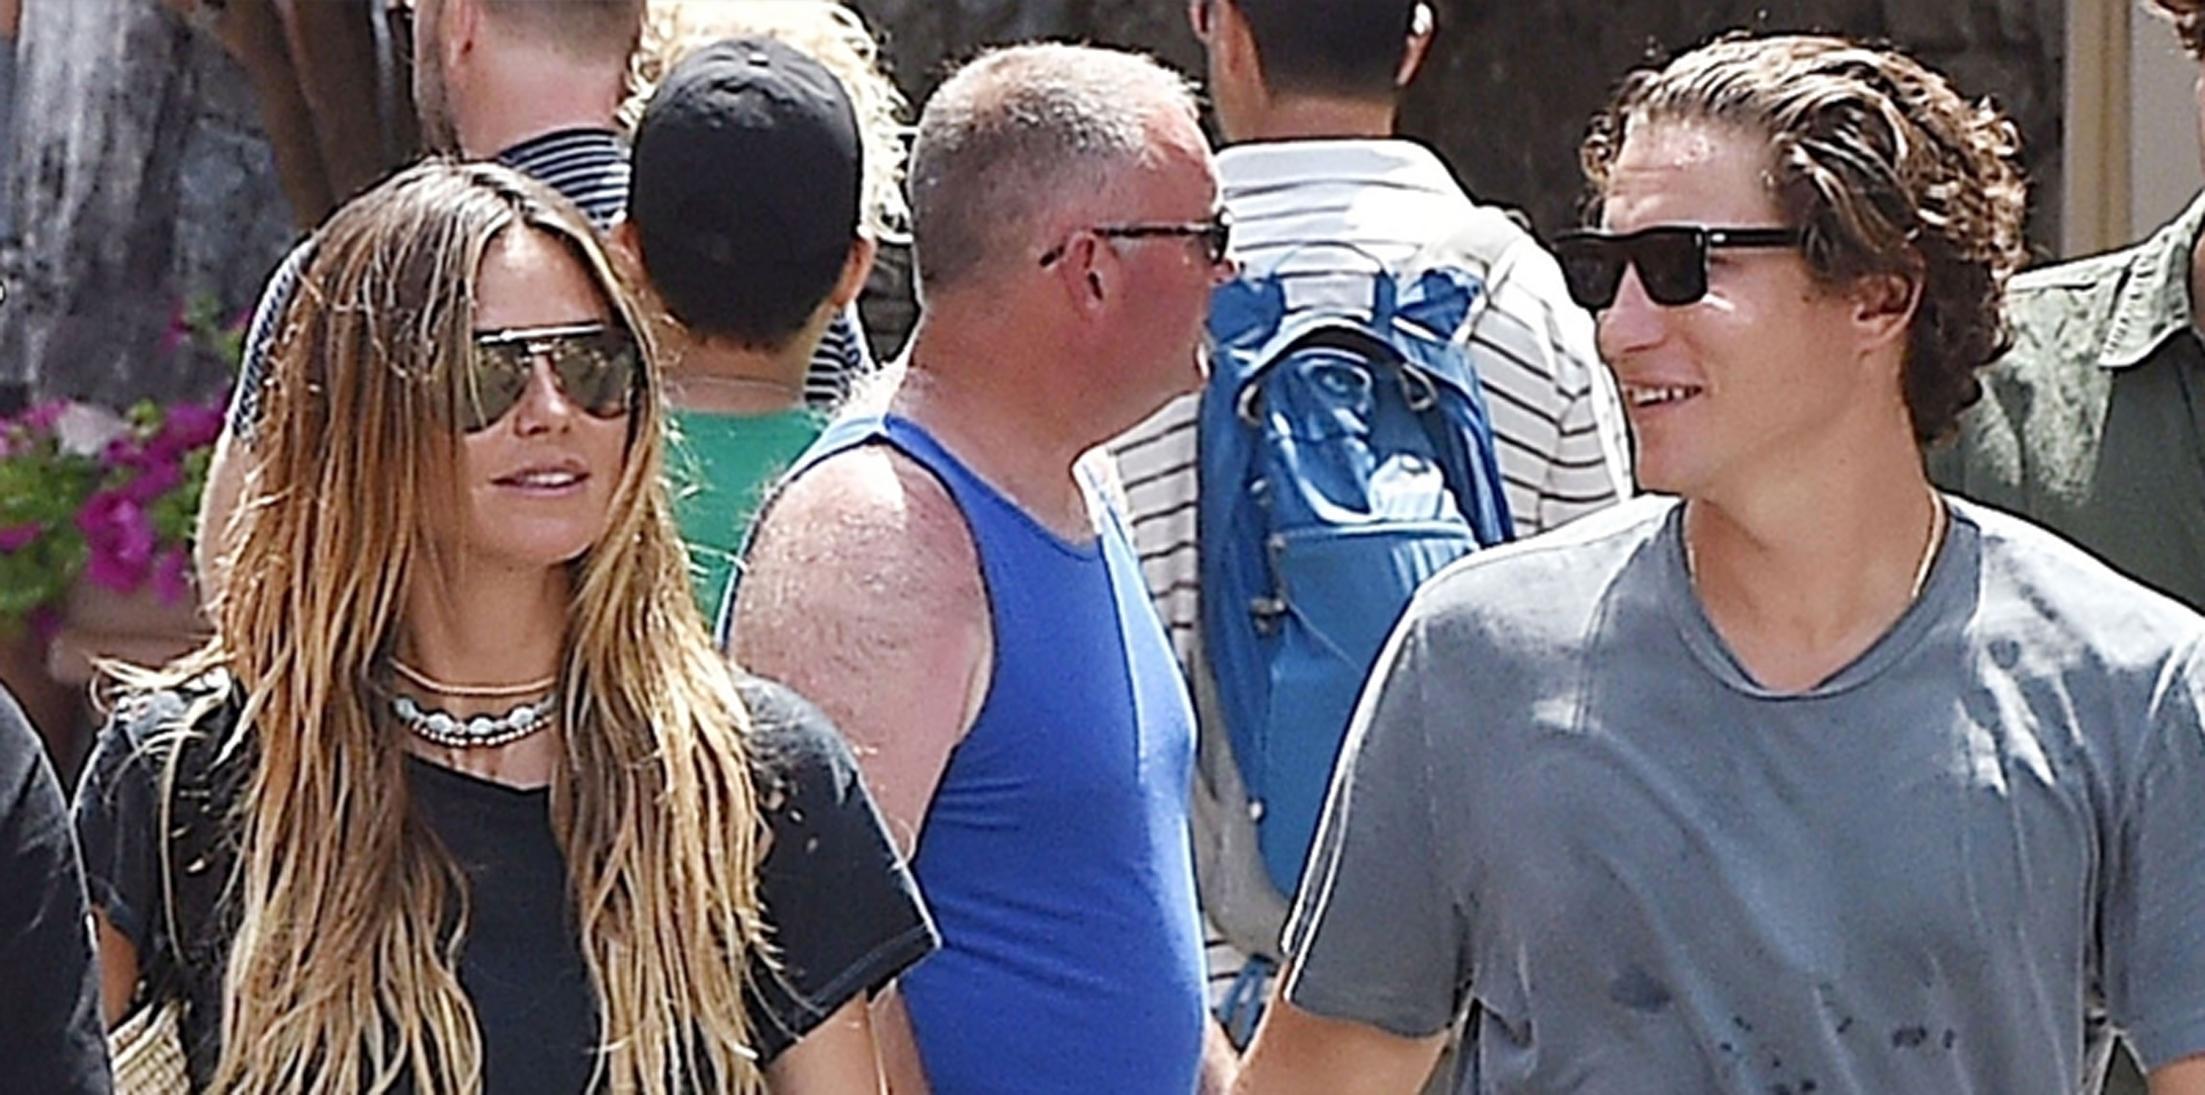 *EXCLUSIVE* German Supermodel Heidi Klum and boyfriend Vito Schnabel enjoy some down time in Portofino